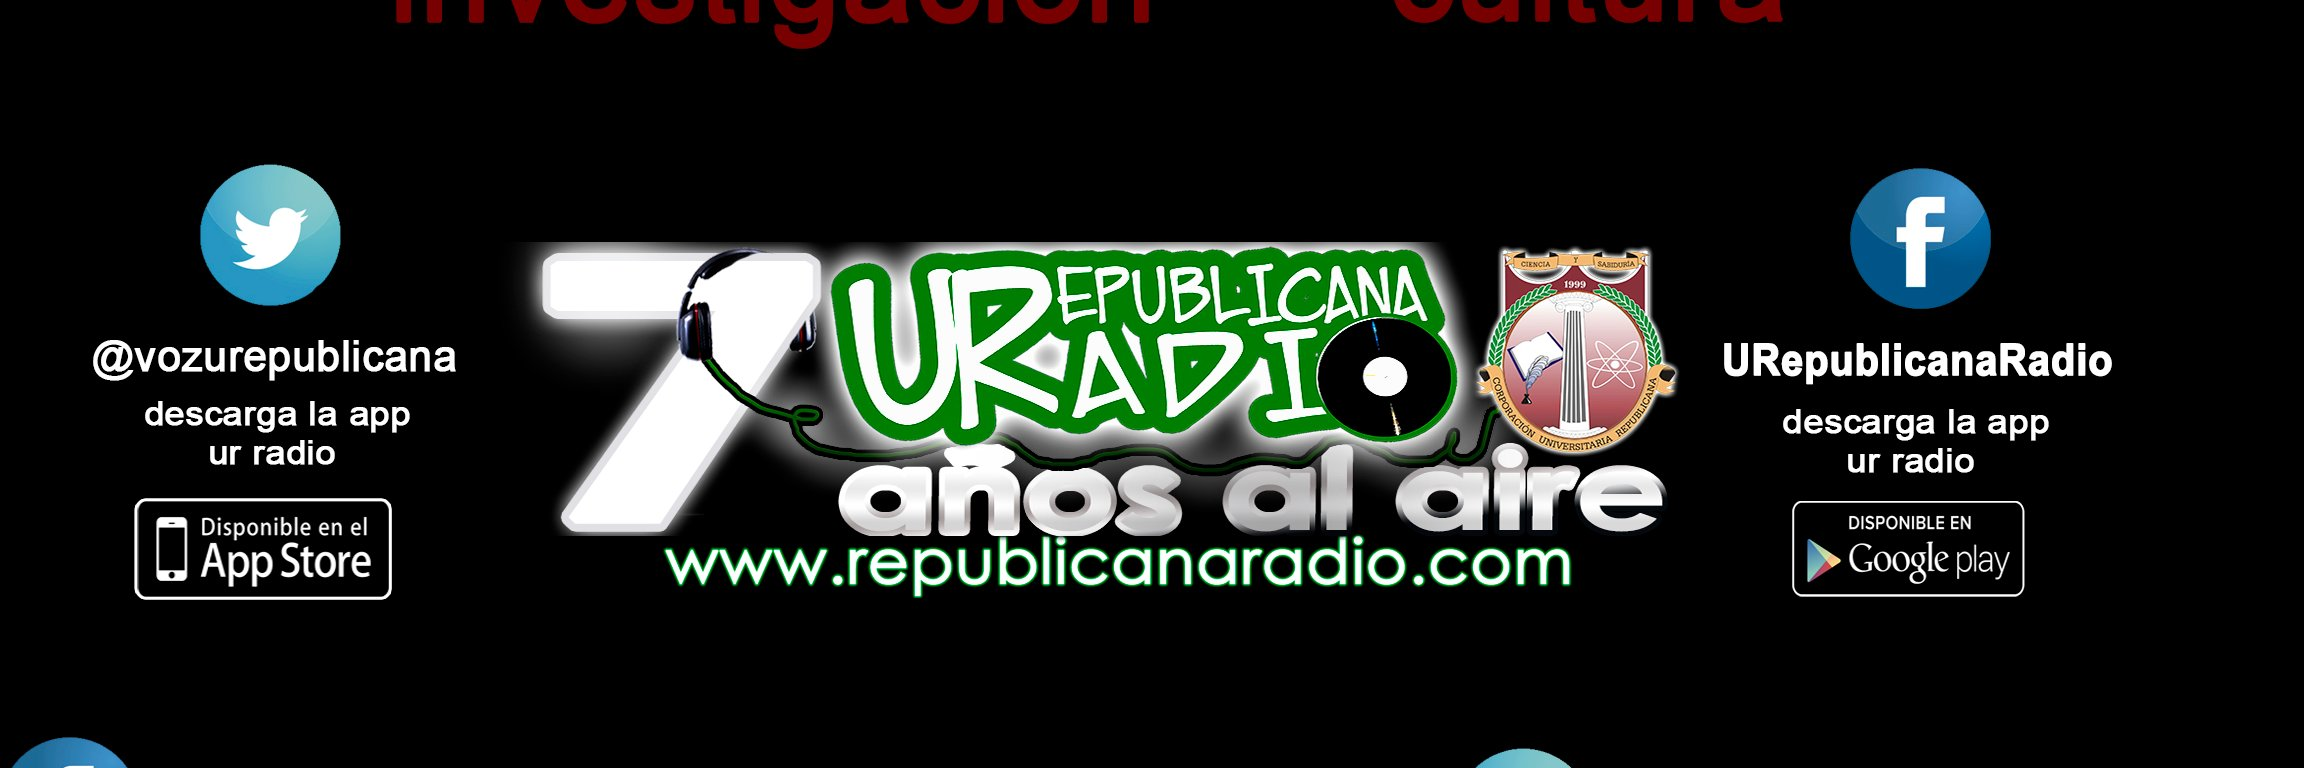 Corporacion Universitaria Republicana's official Twitter account